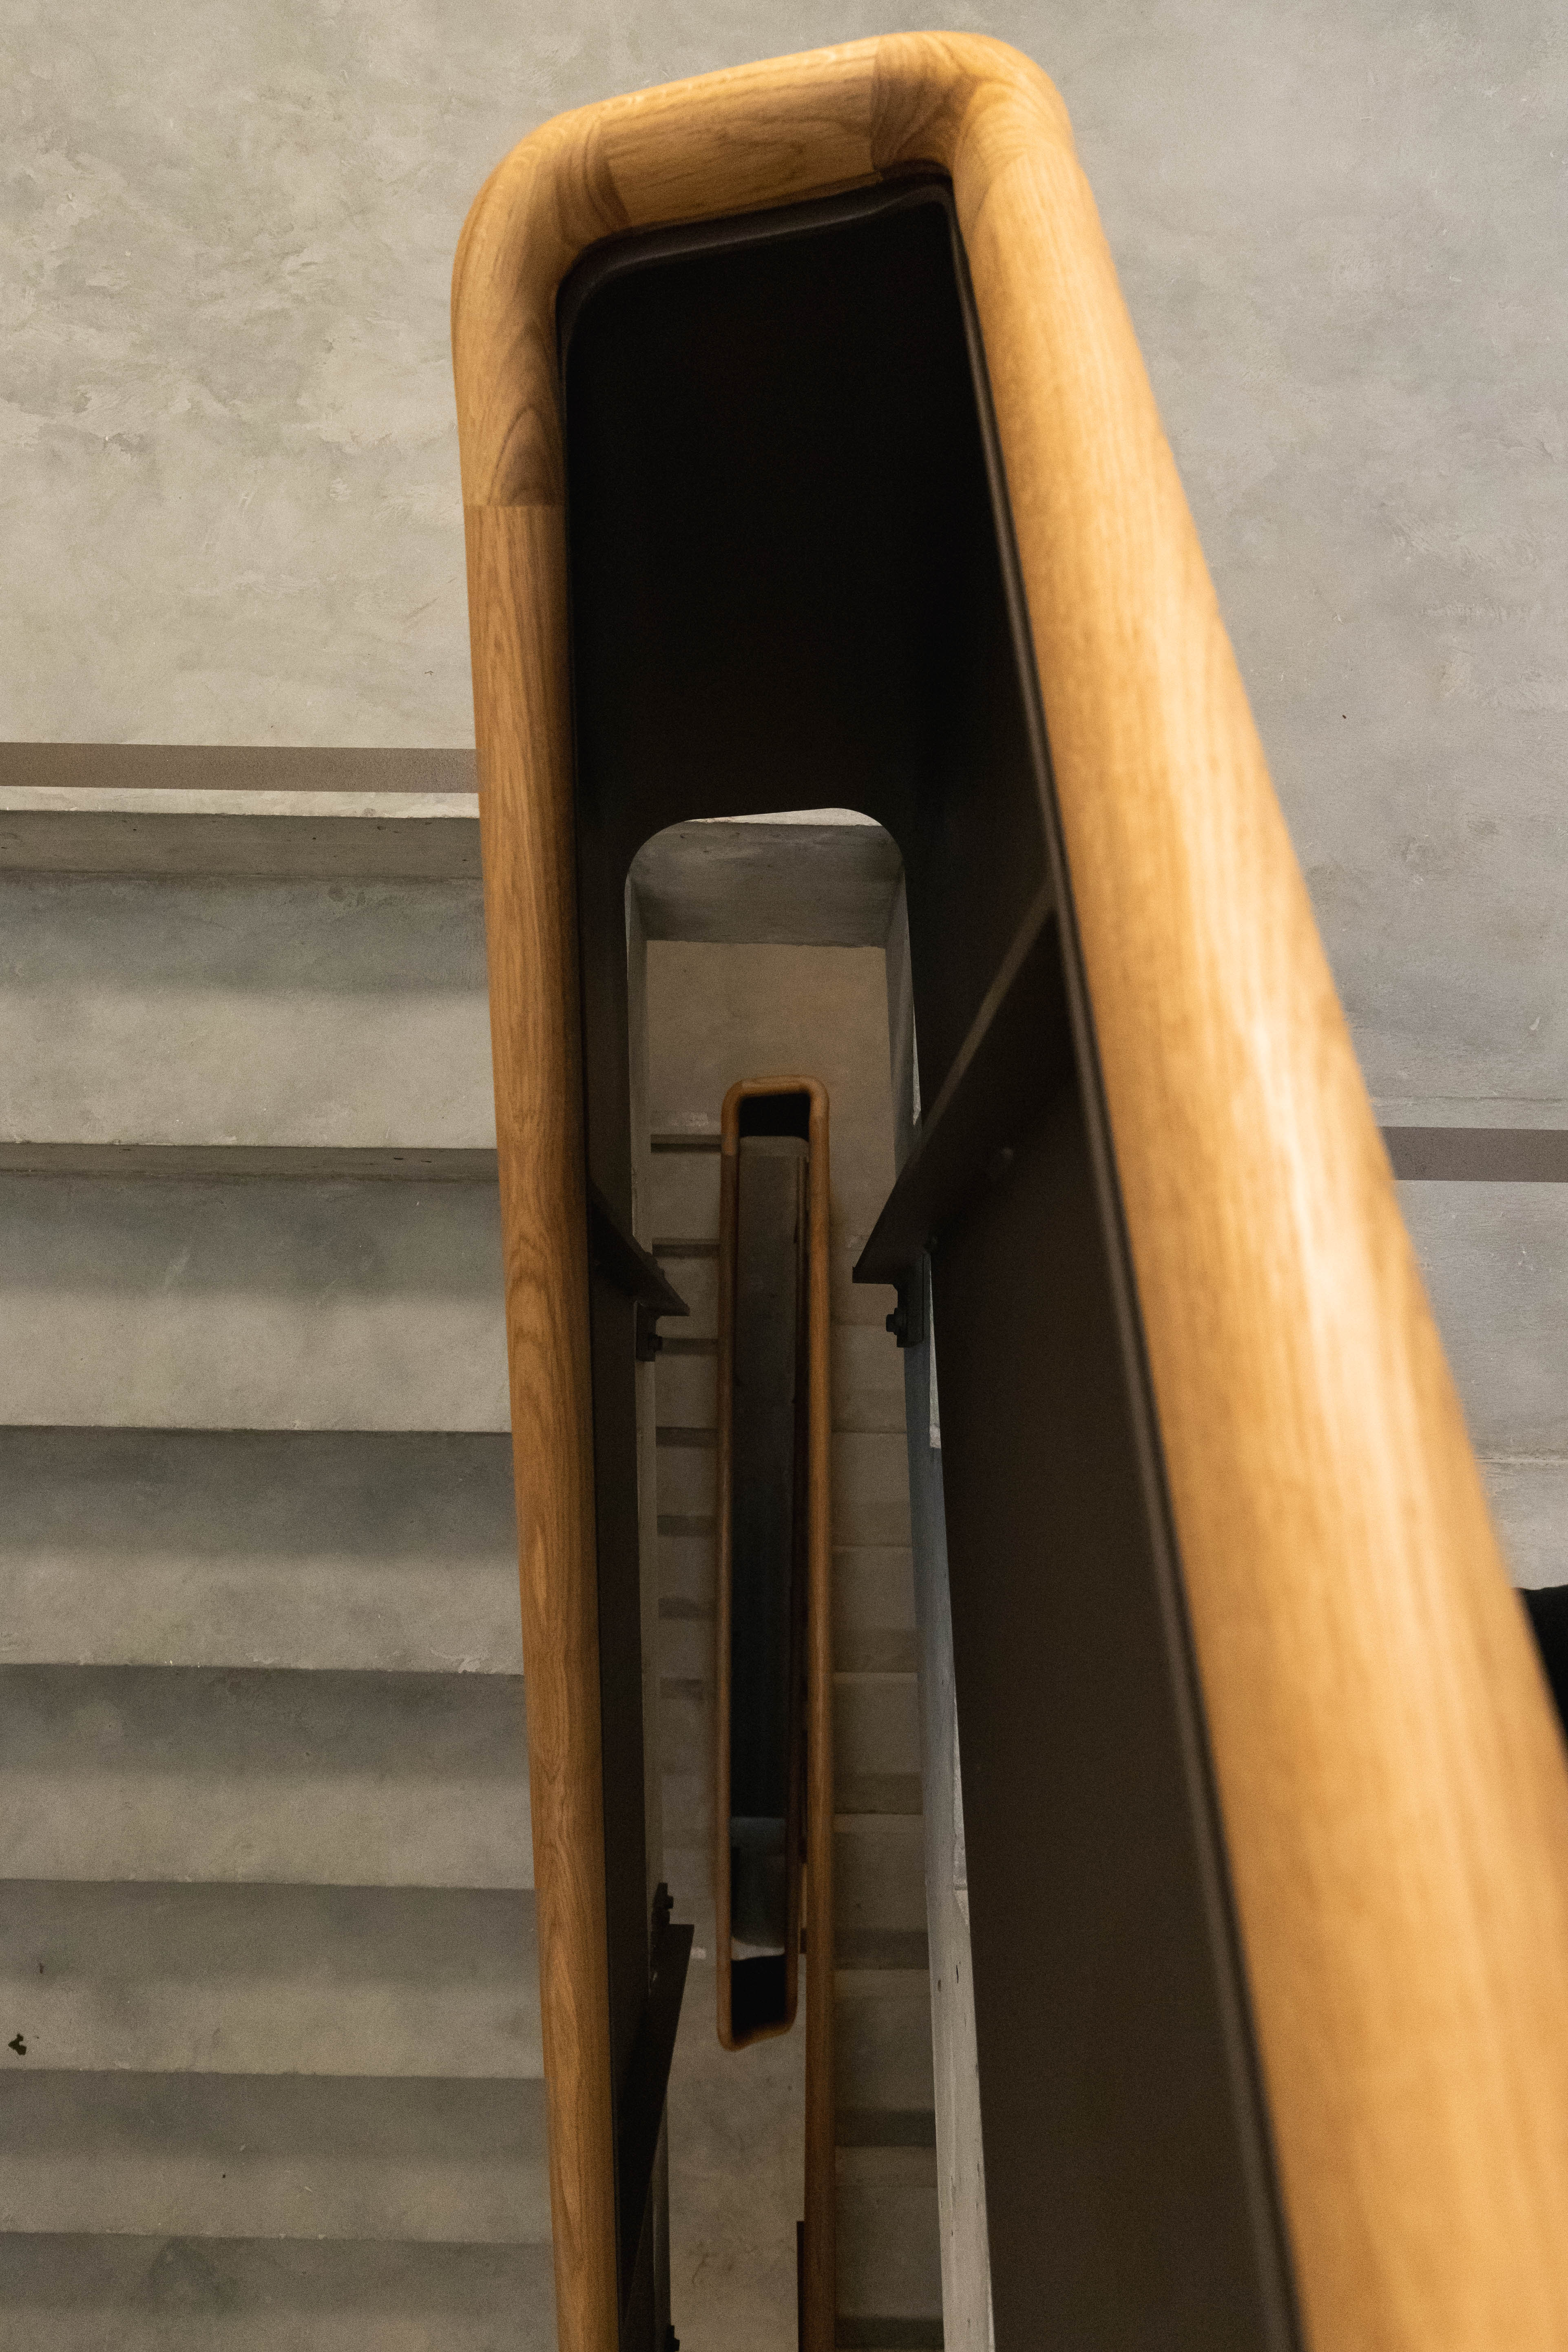 Stair Image 2314